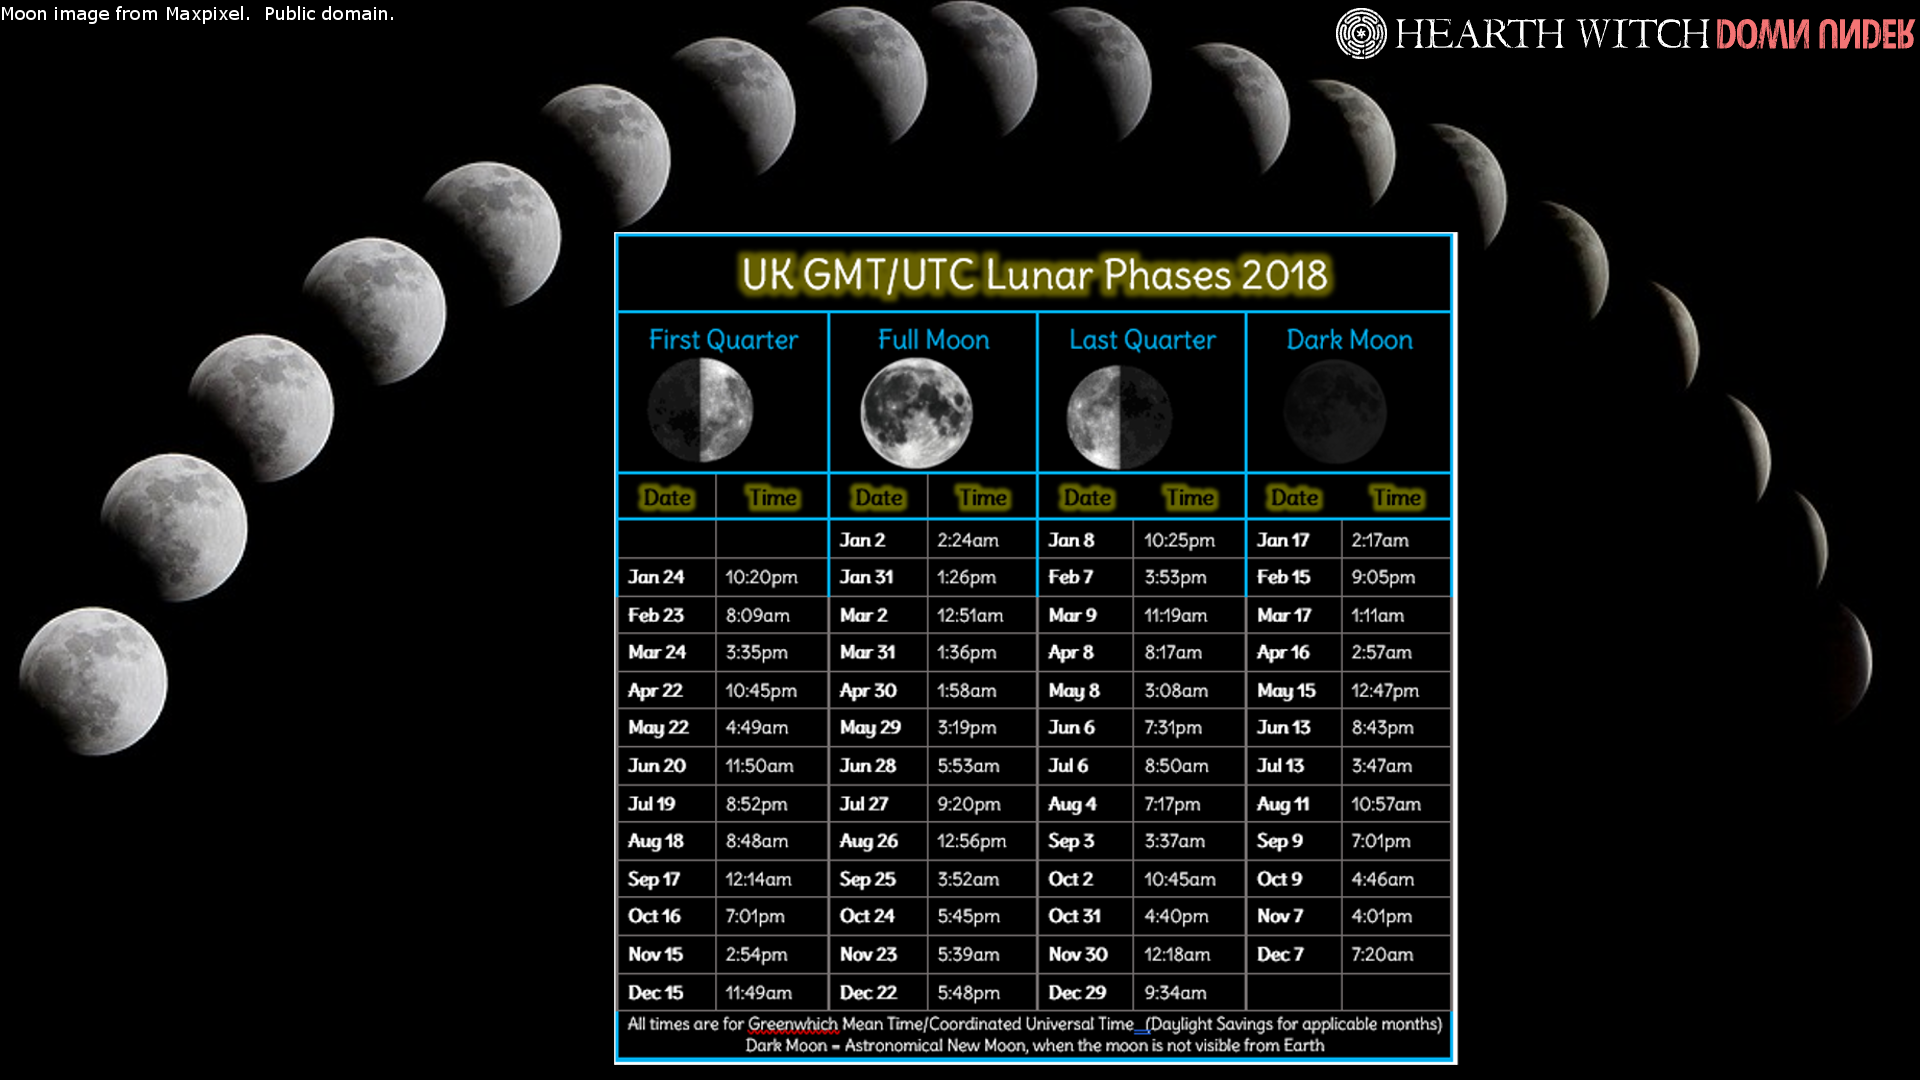 Moon phase wallpaper, UK GMT/UTC 2018